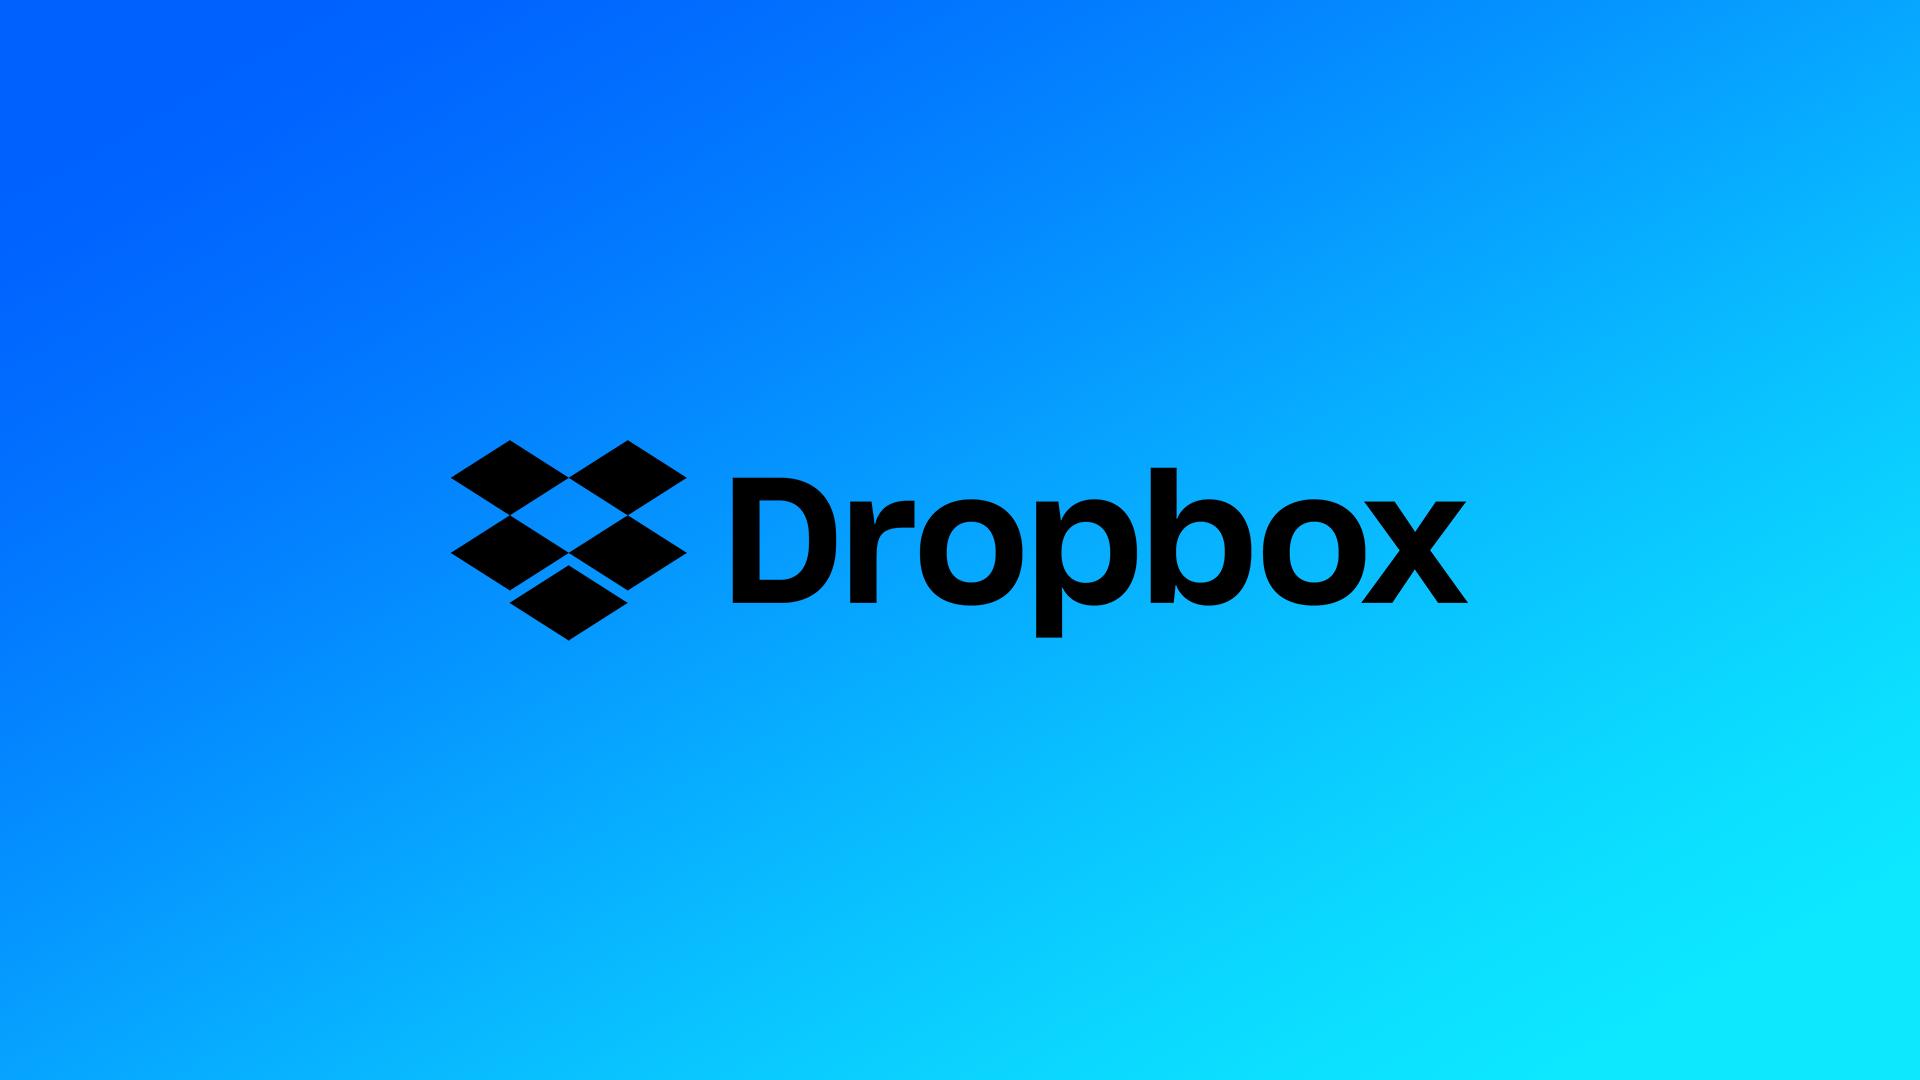 dropbox - thumb.png